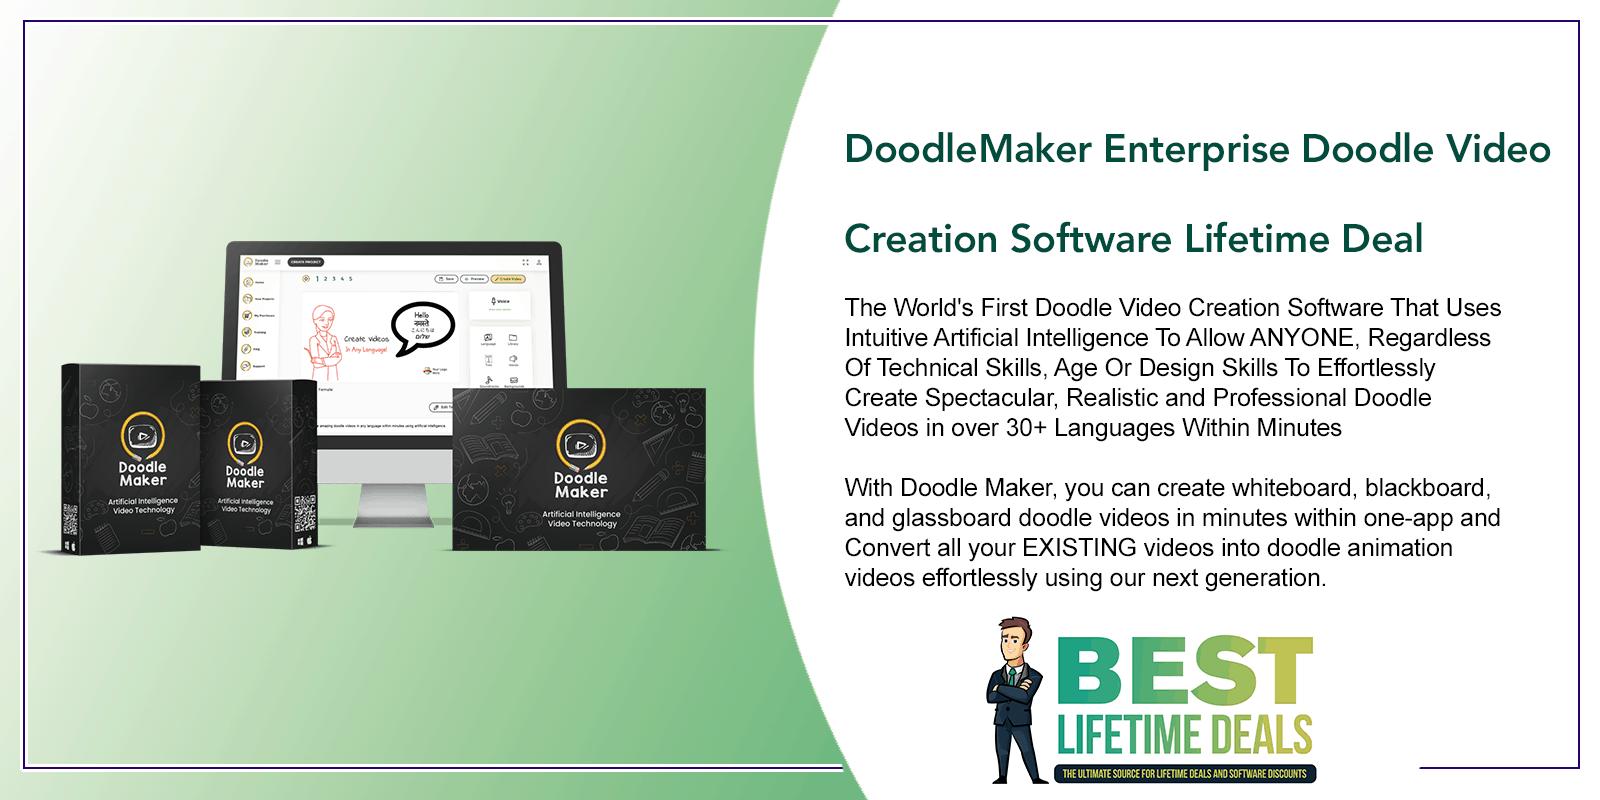 DoodleMaker Enterprise Doodle Video Creation Software Featured Image